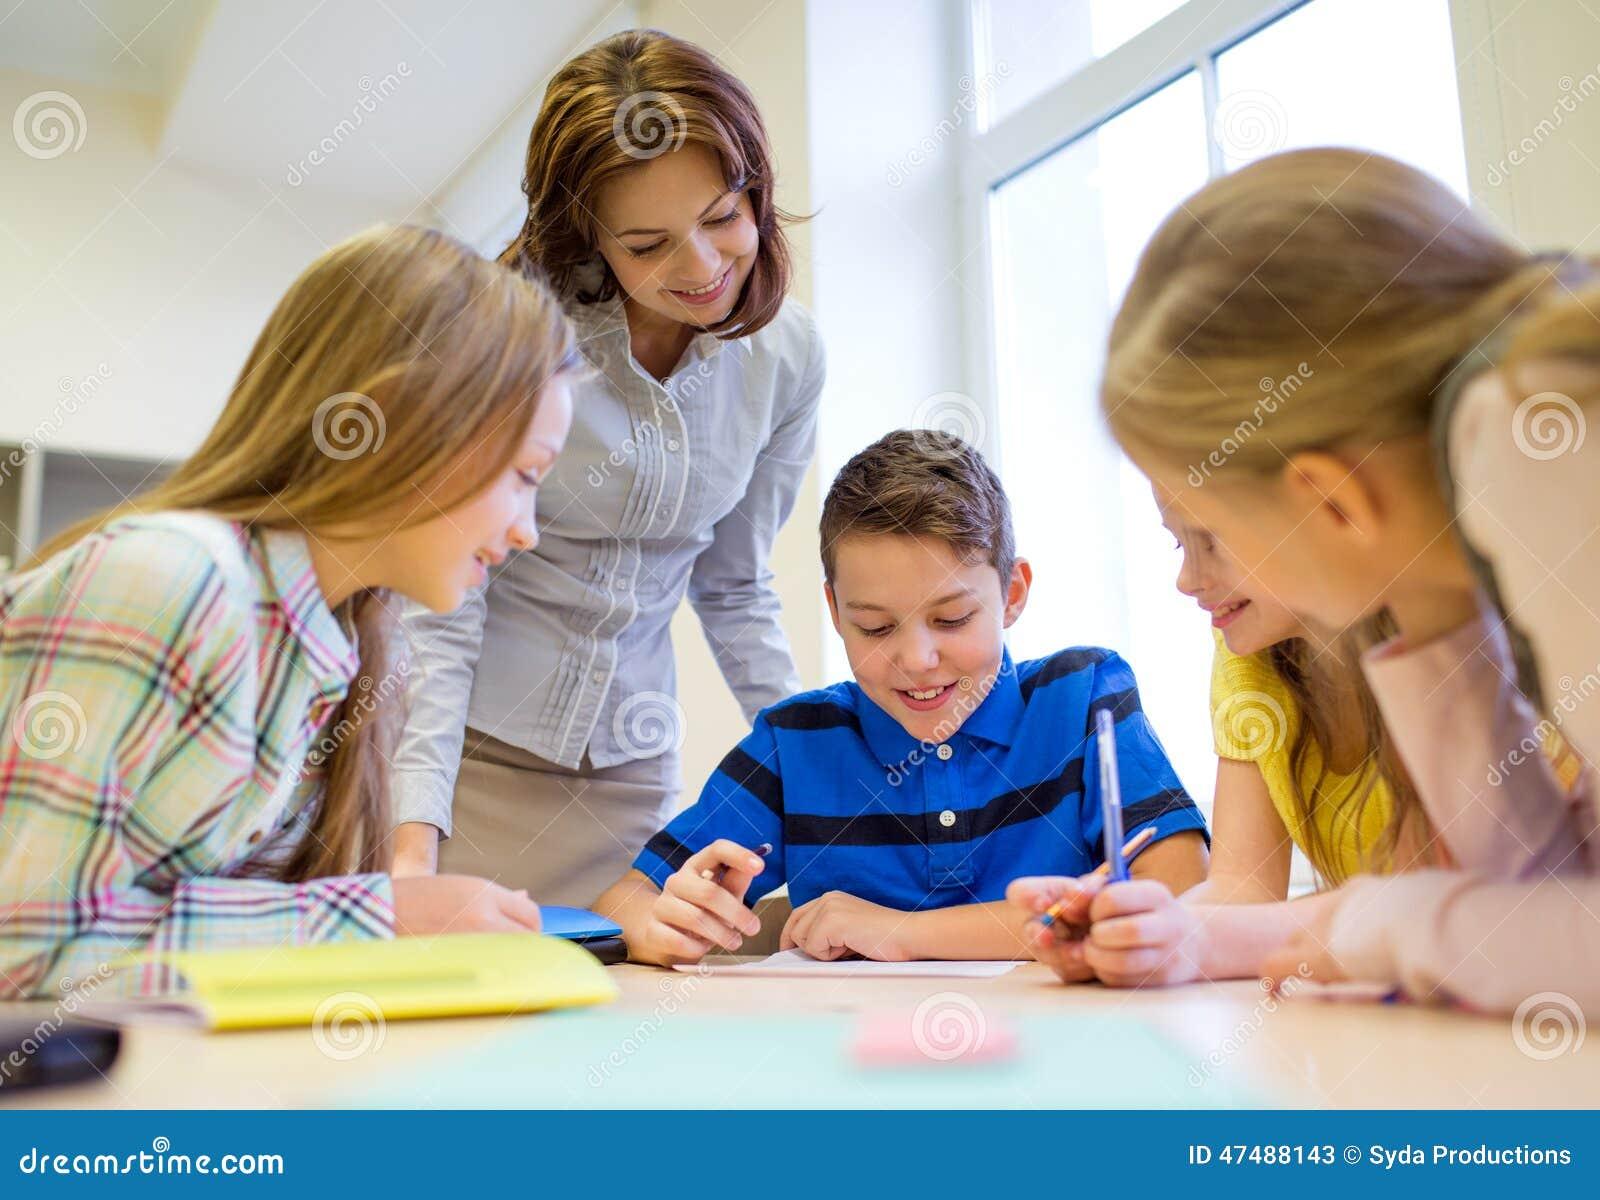 Elementary Group 43